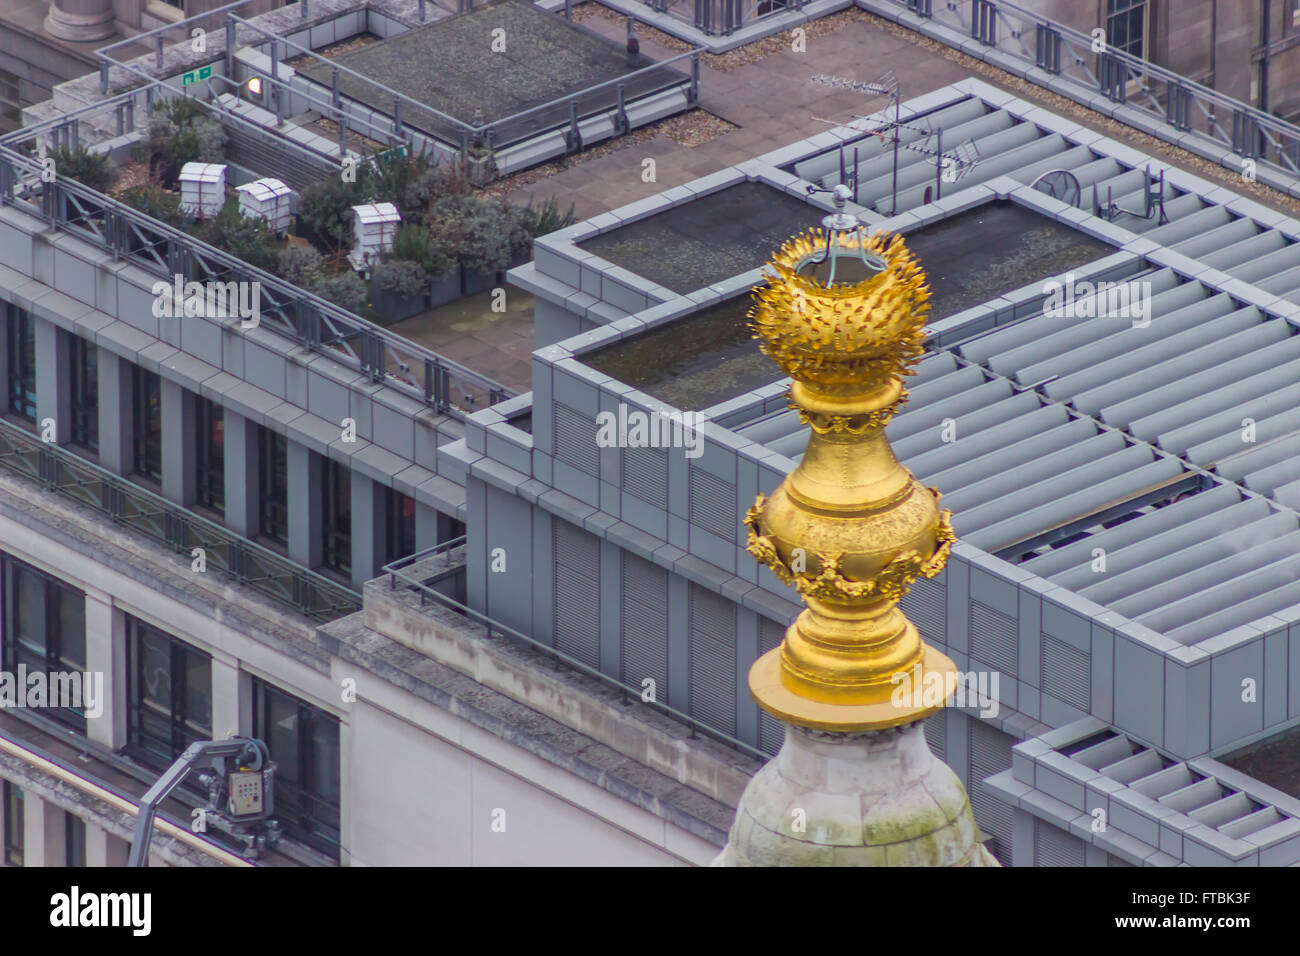 Oben auf dem Denkmal für den großen Brand in London. Stockbild